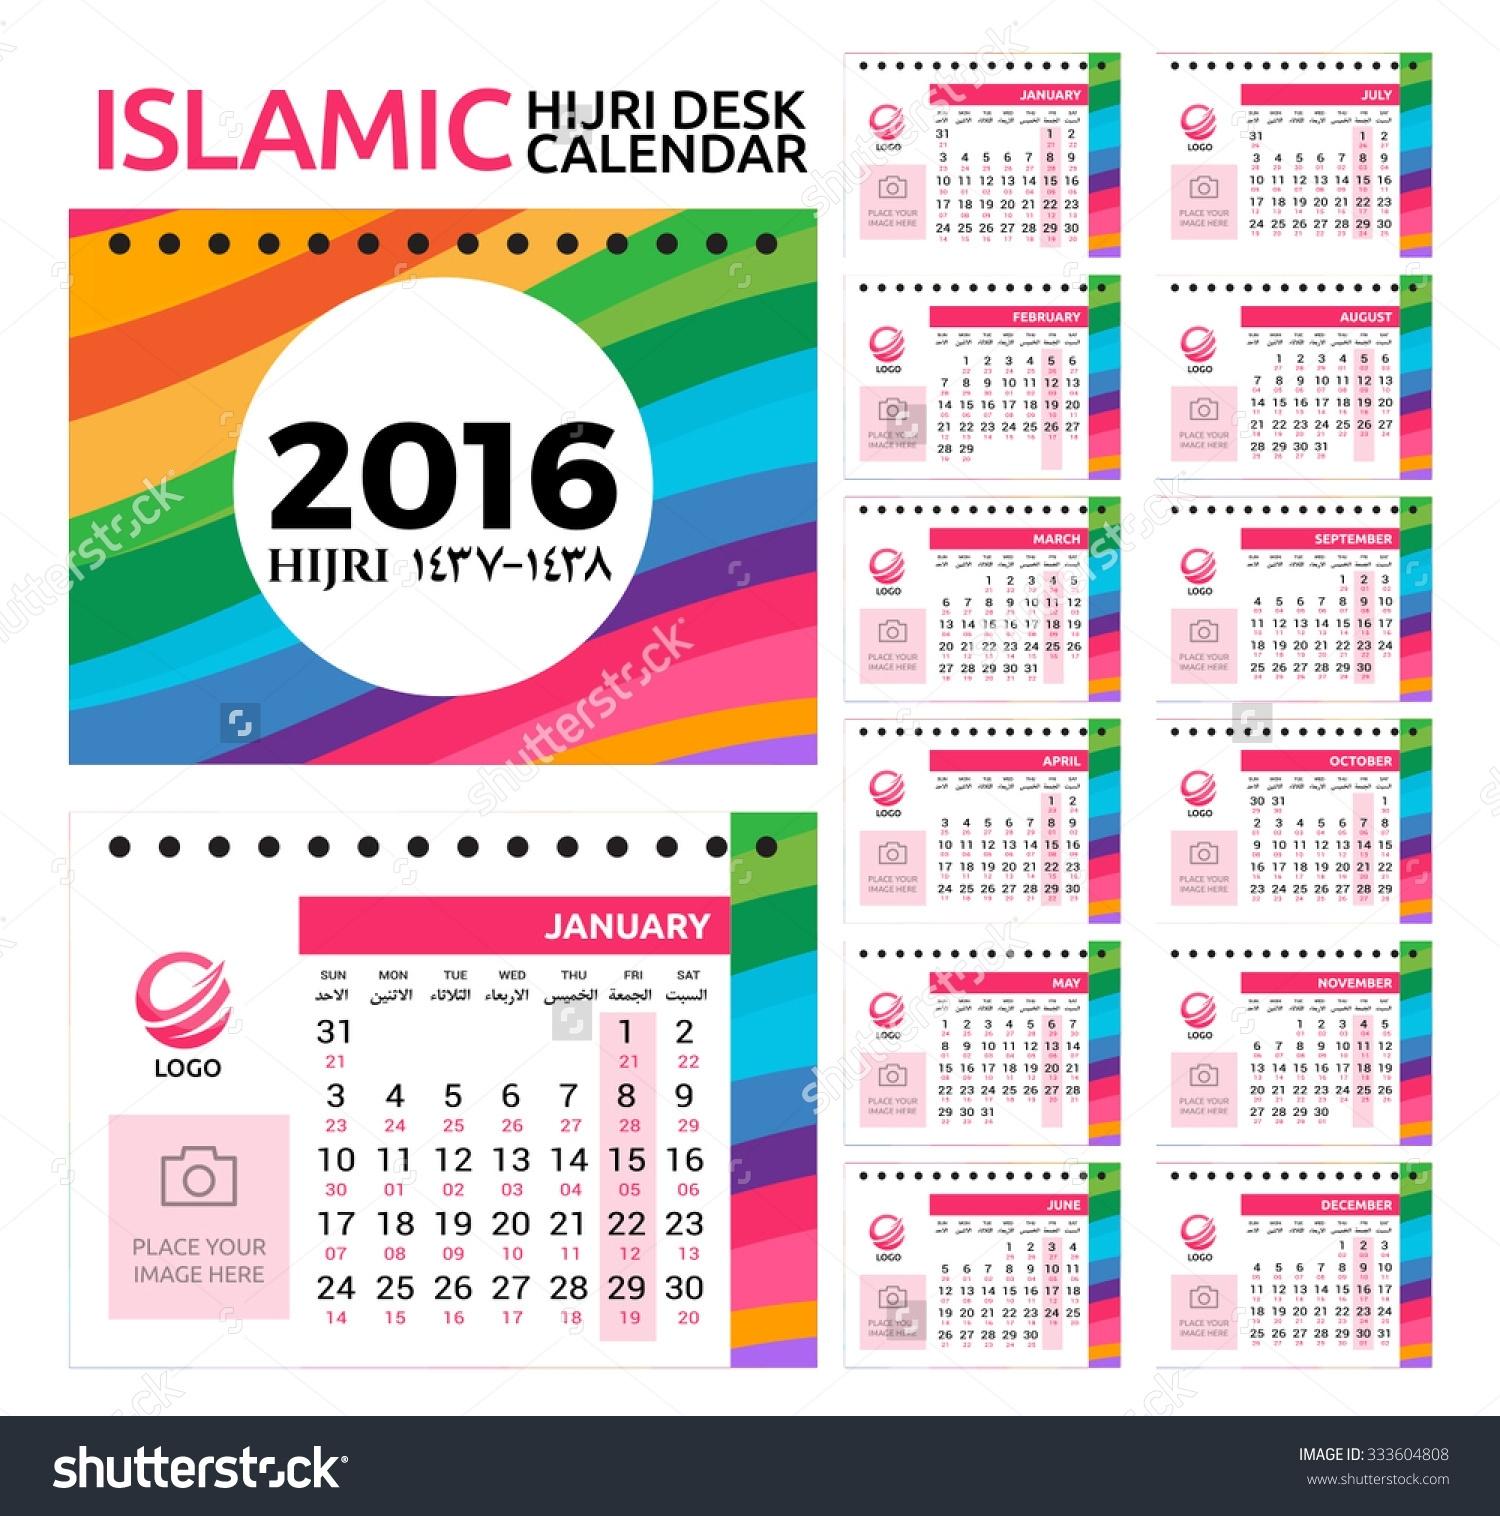 Islamic Calendar | Printable Calendar Template with Islamic Calander Template Lunar Cycle